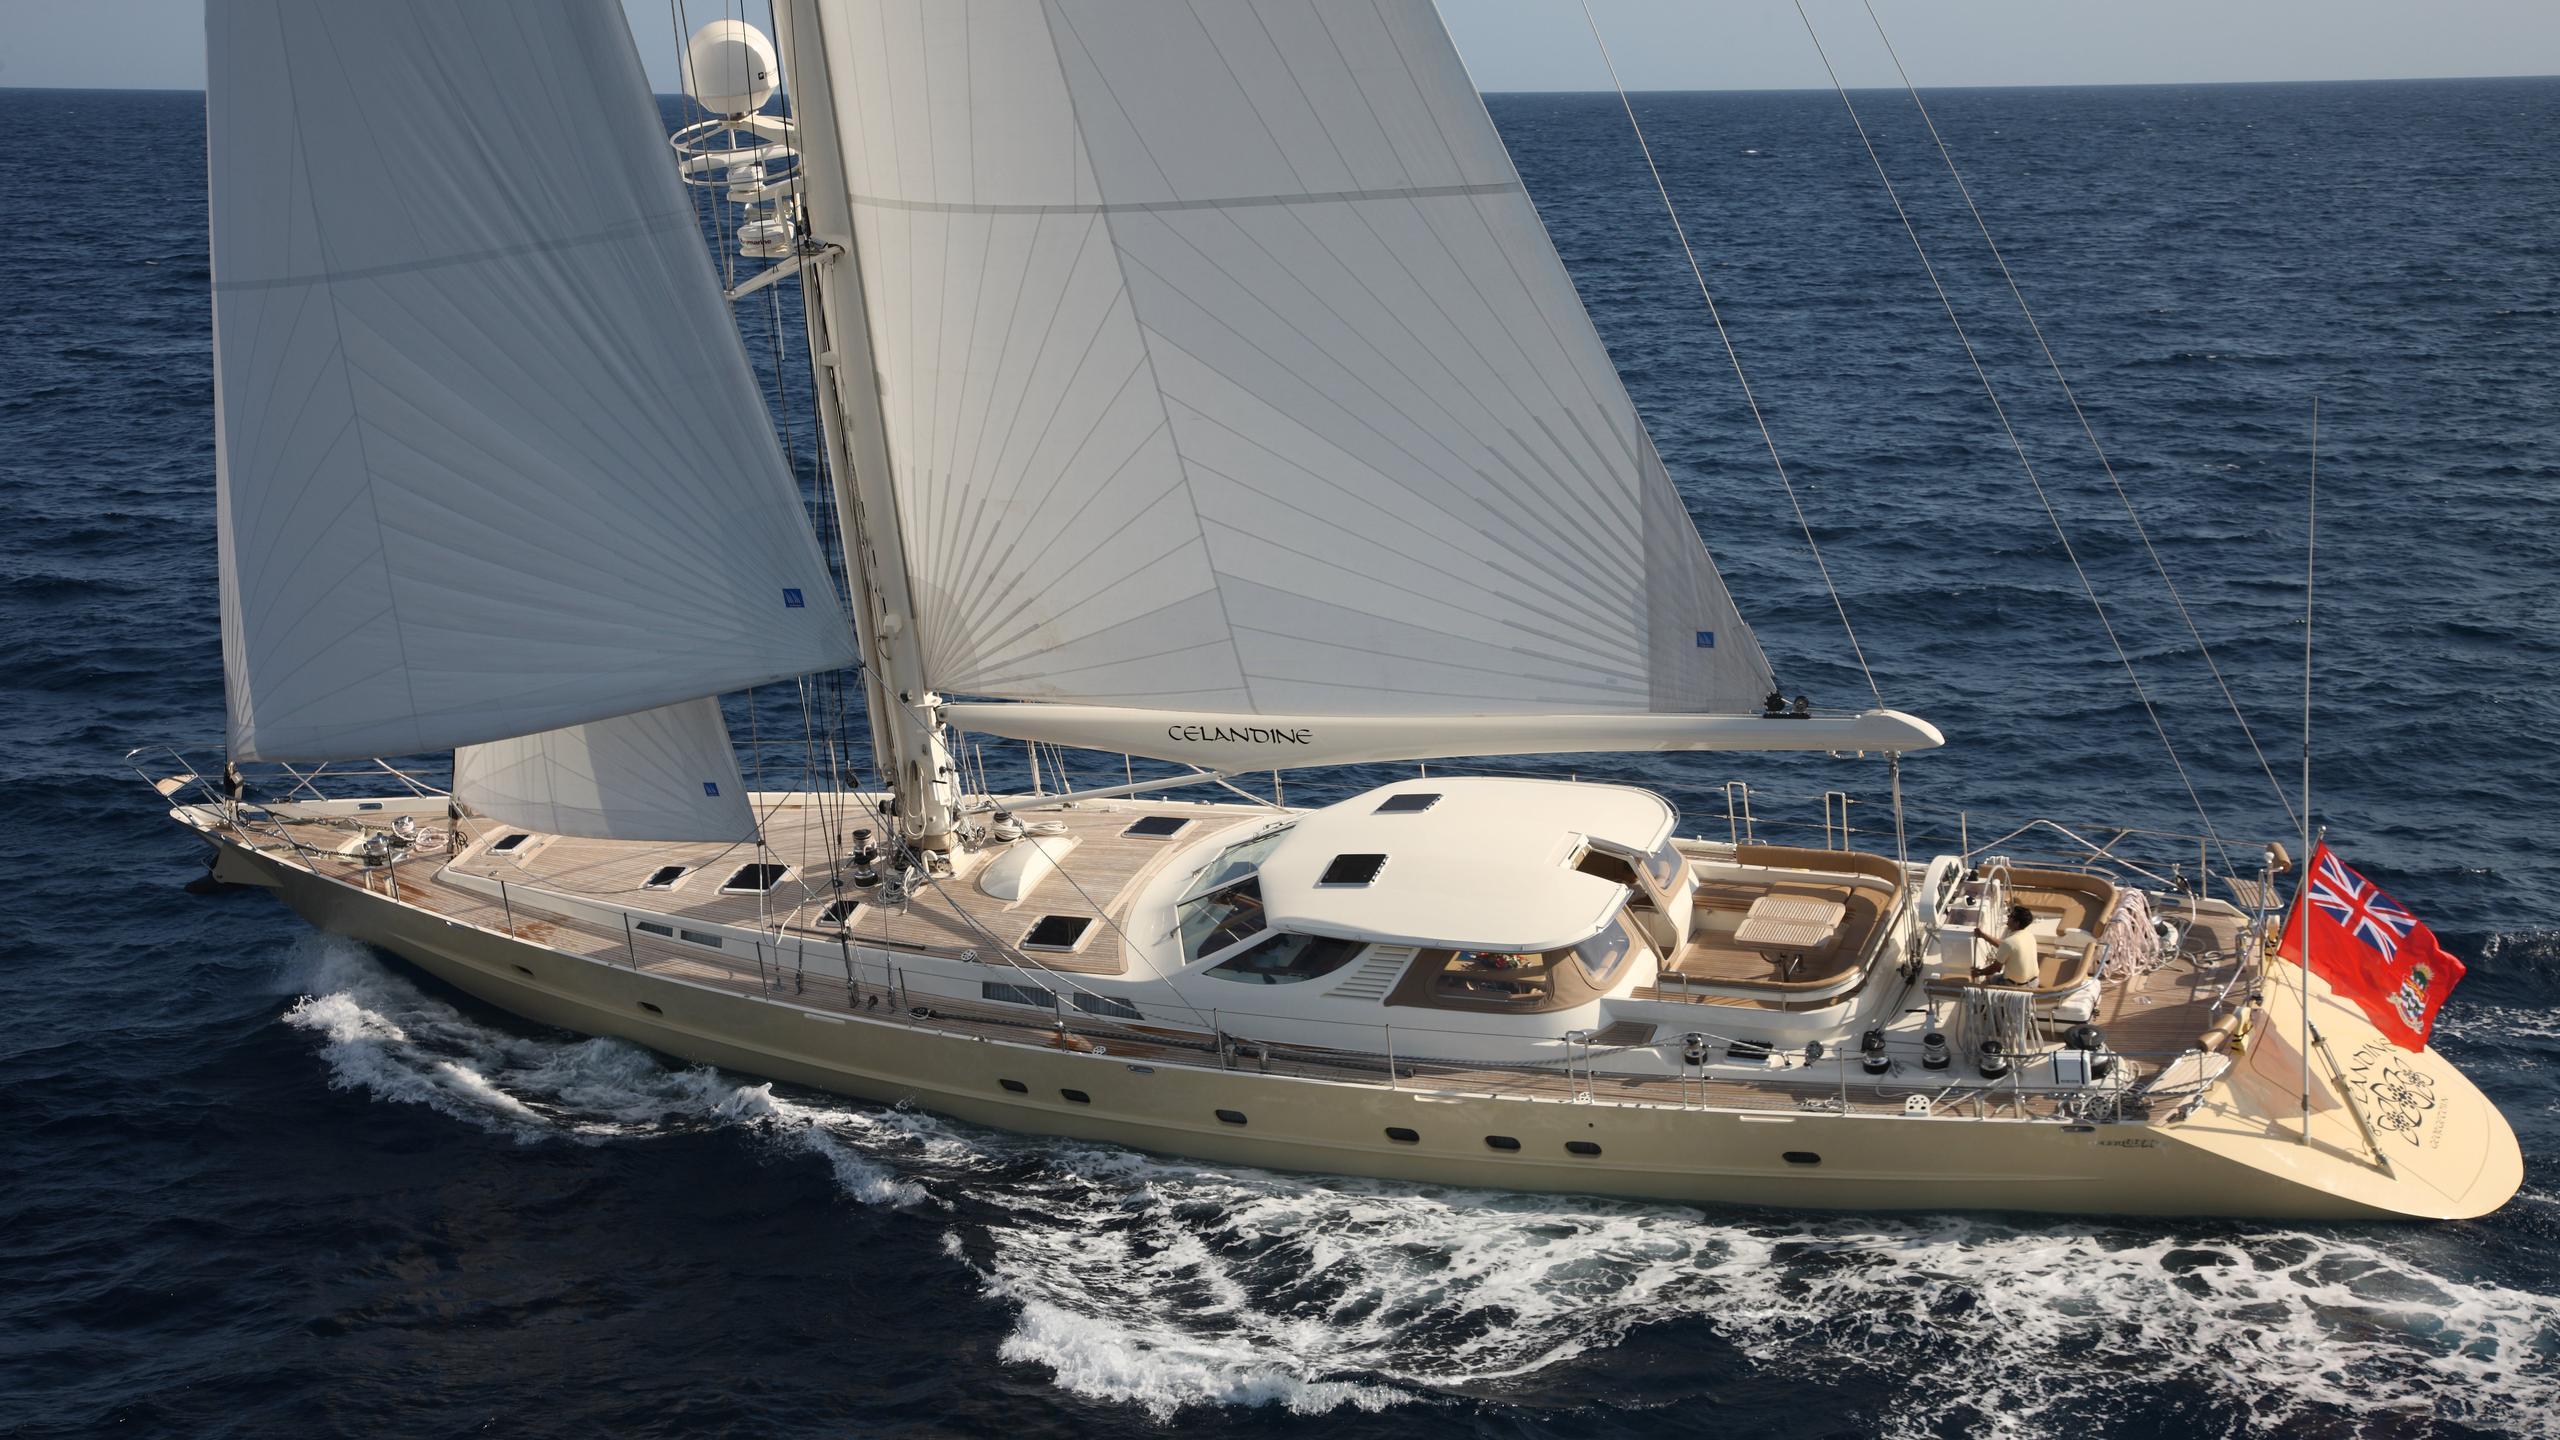 celandine-yacht-for-sale-profile